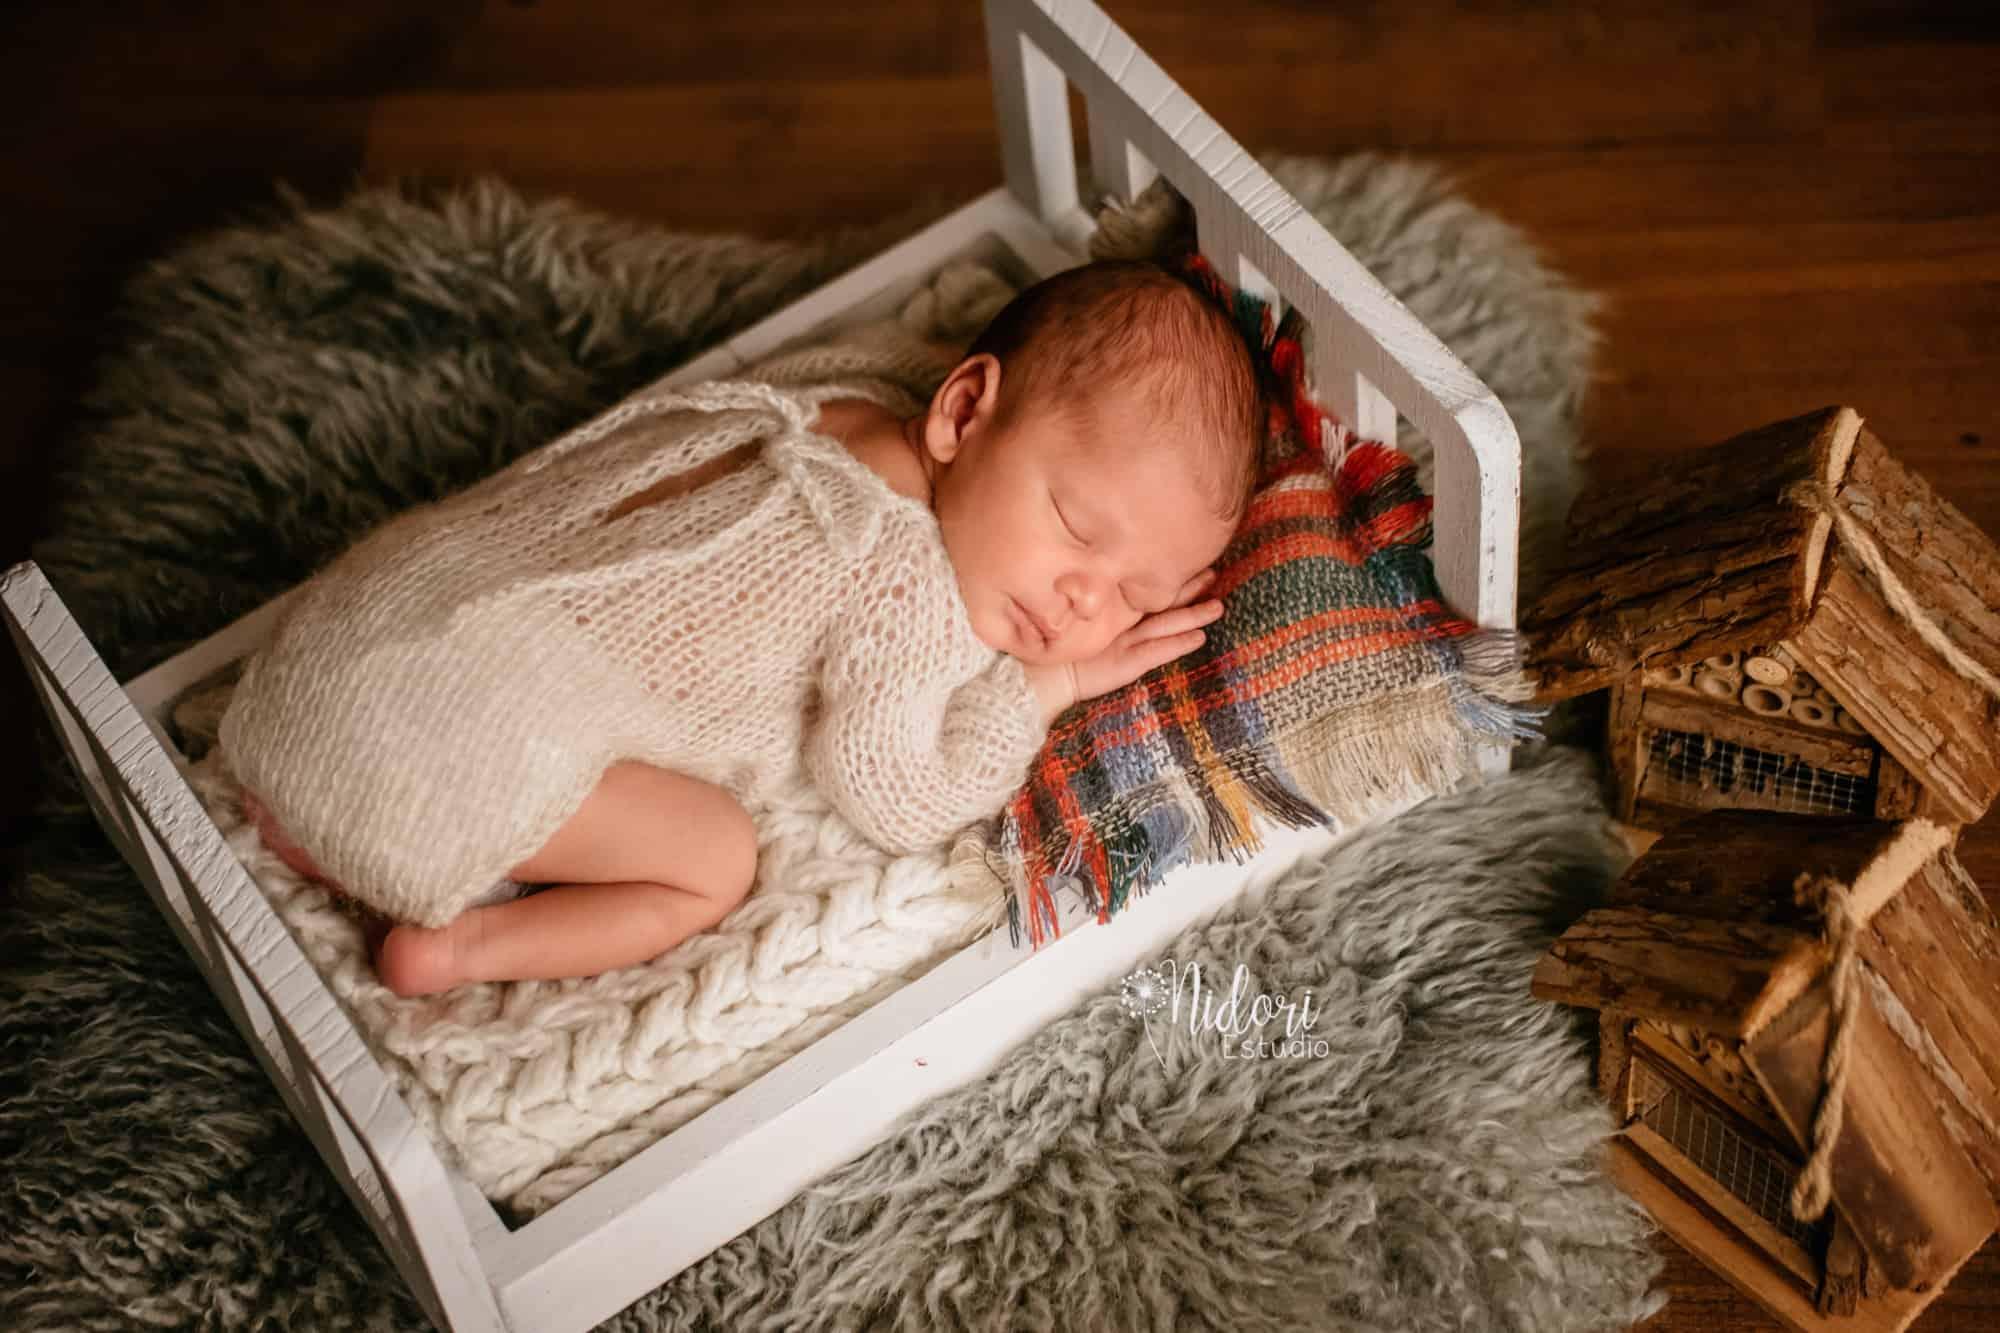 fotosbebe-fotografia-recien-nacido-newborn-bebes-nidoriestudio-fotos-valencia-almazora-castellon-españa-spain-11